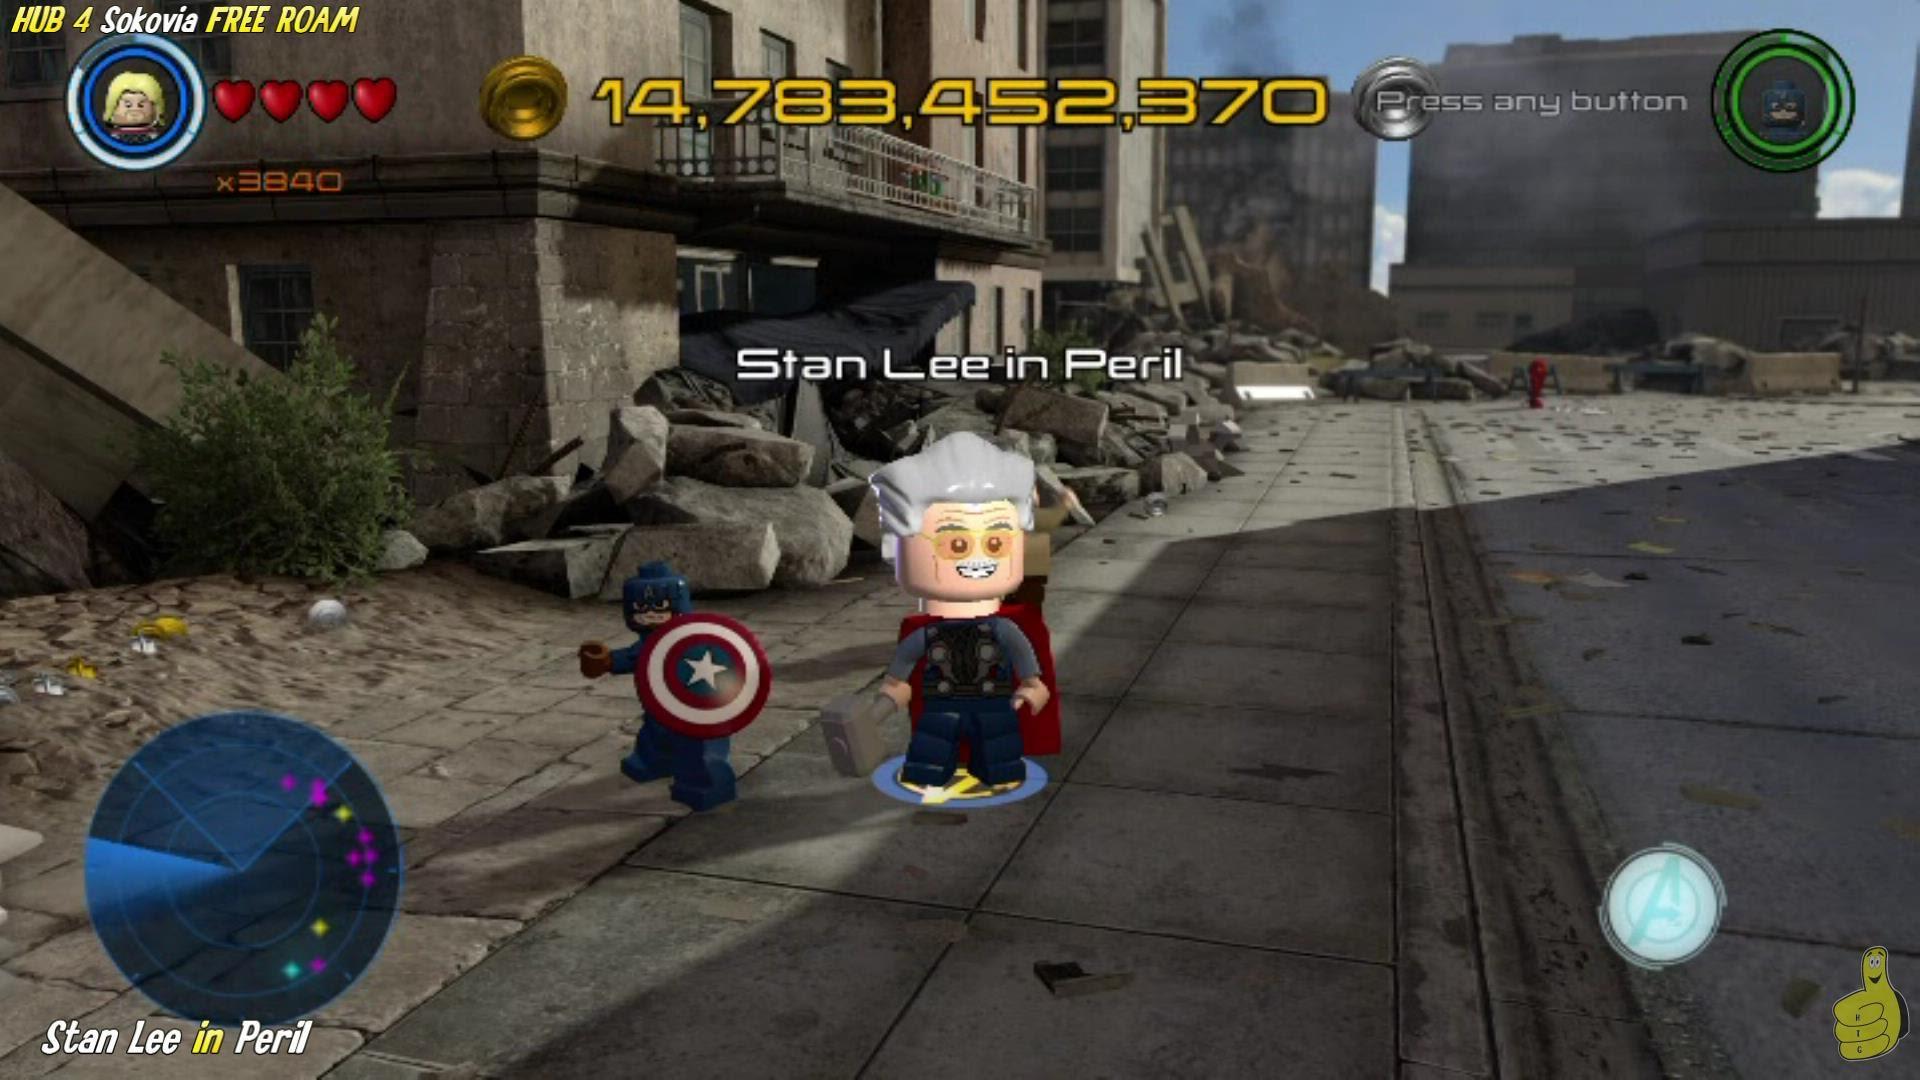 Lego Marvel Avengers: HUB 4 / Sokovia FREE ROAM (All Collectibles) – HTG